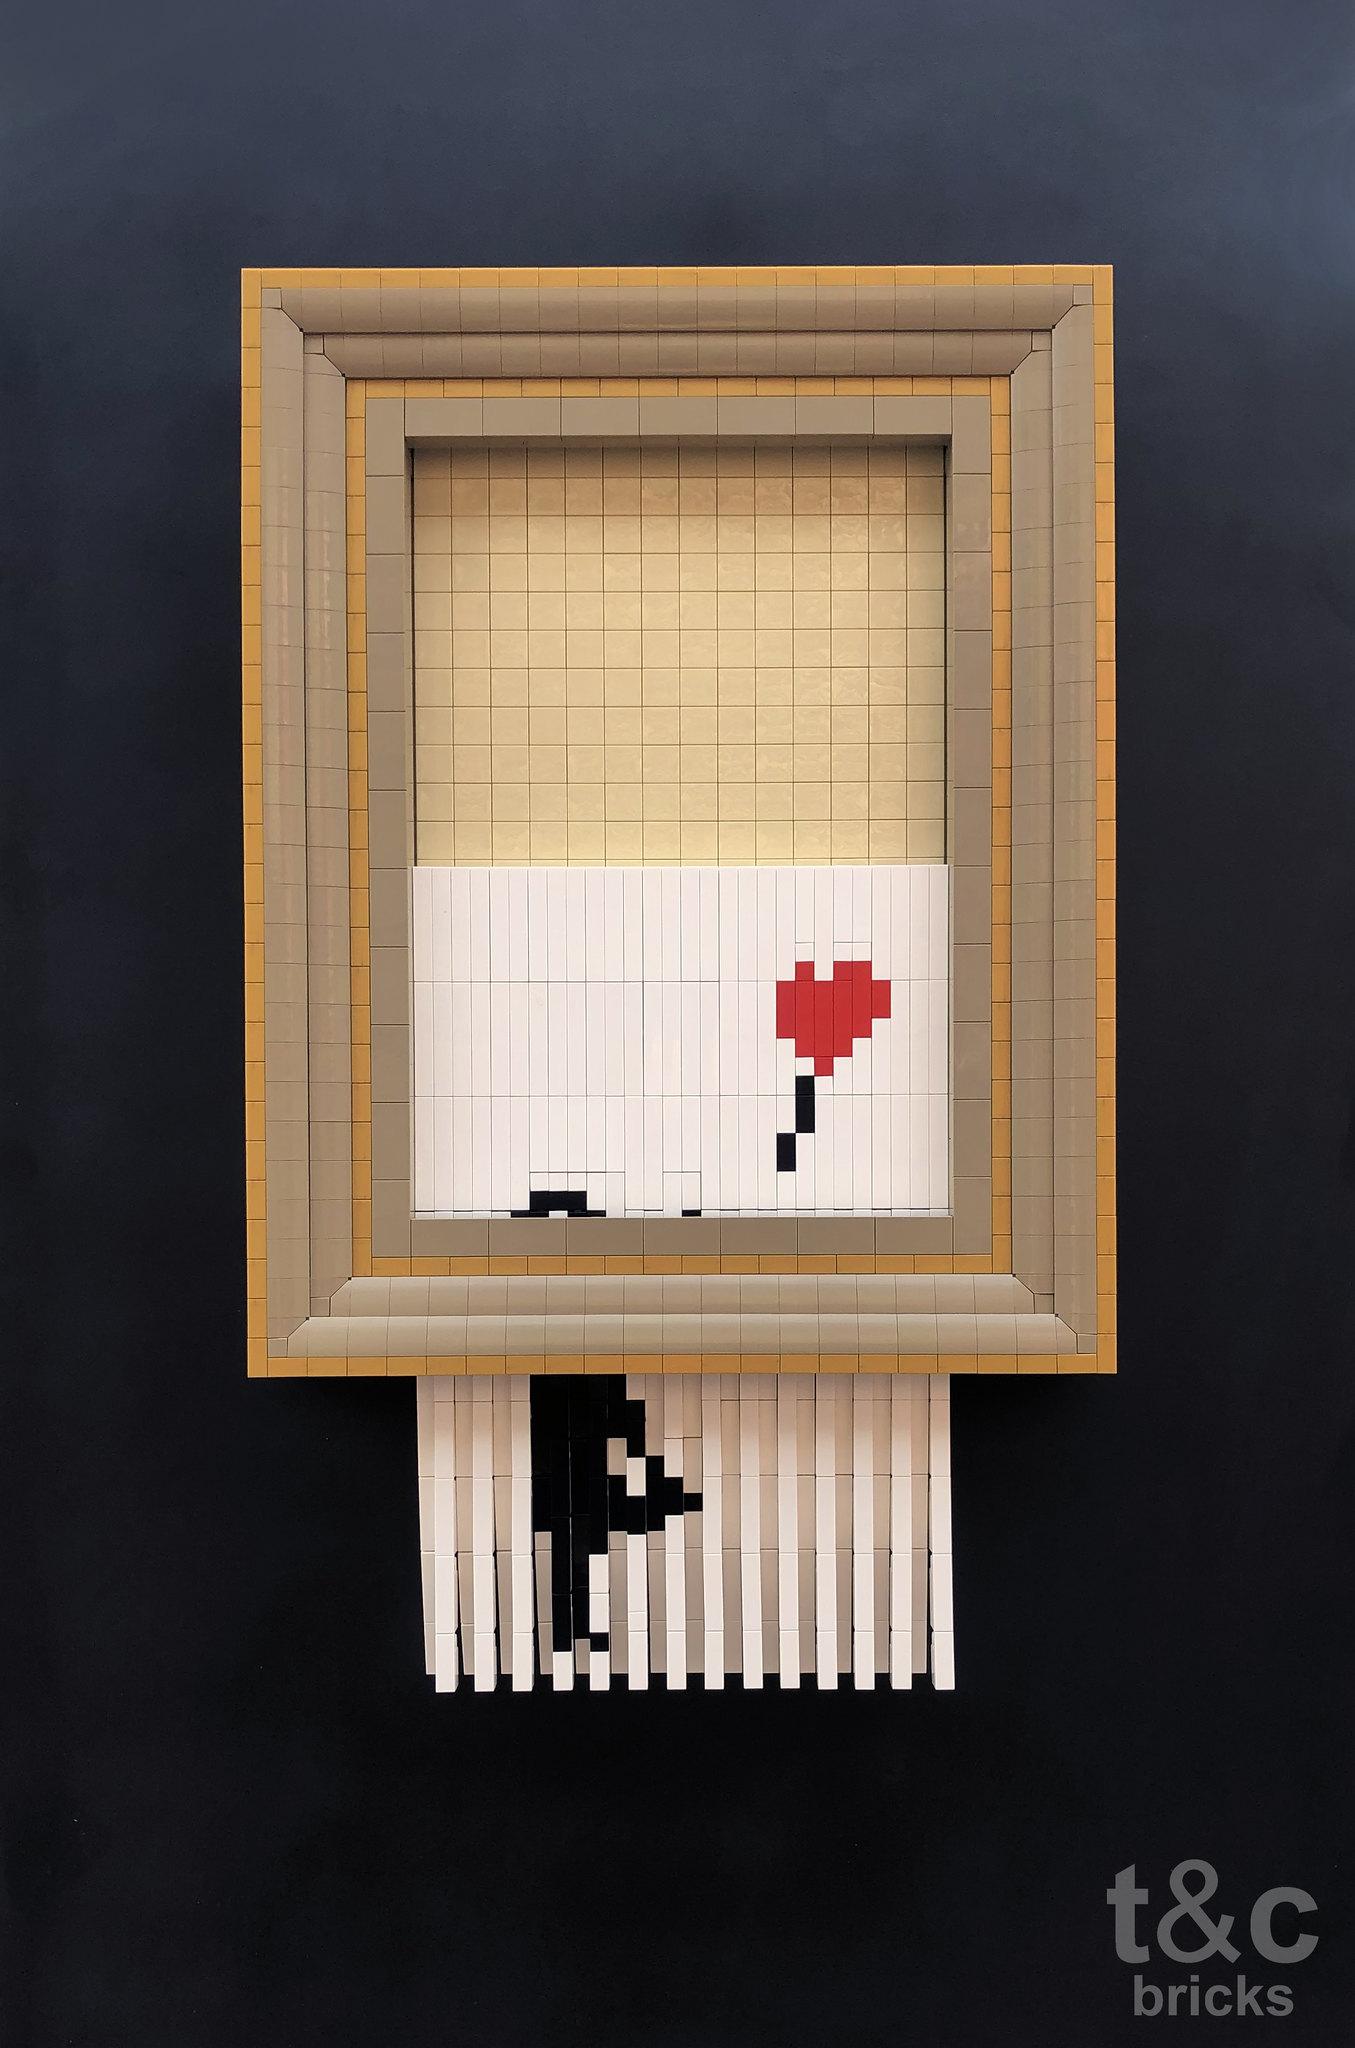 LEGO Evolution of Art - T&C Bricks